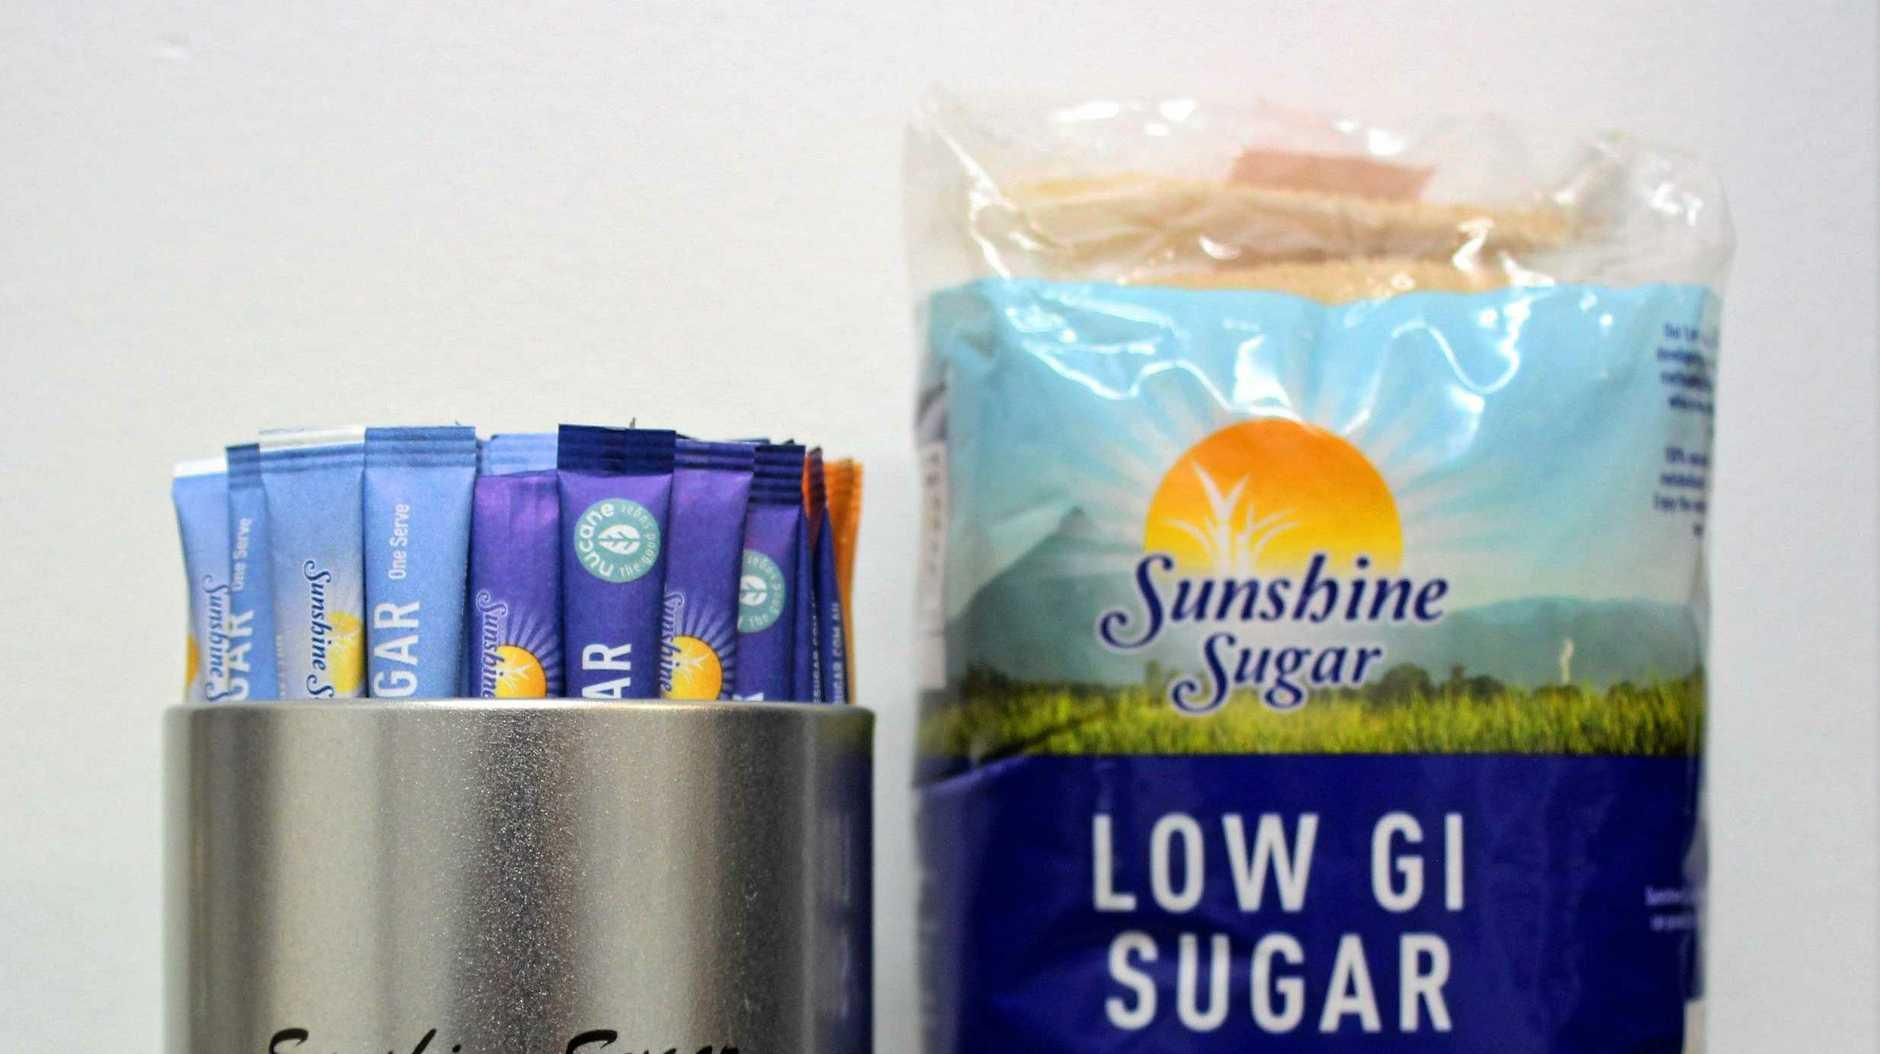 SWEET SENSATION: Sunshine Sugar's Low GI range has been a hit.